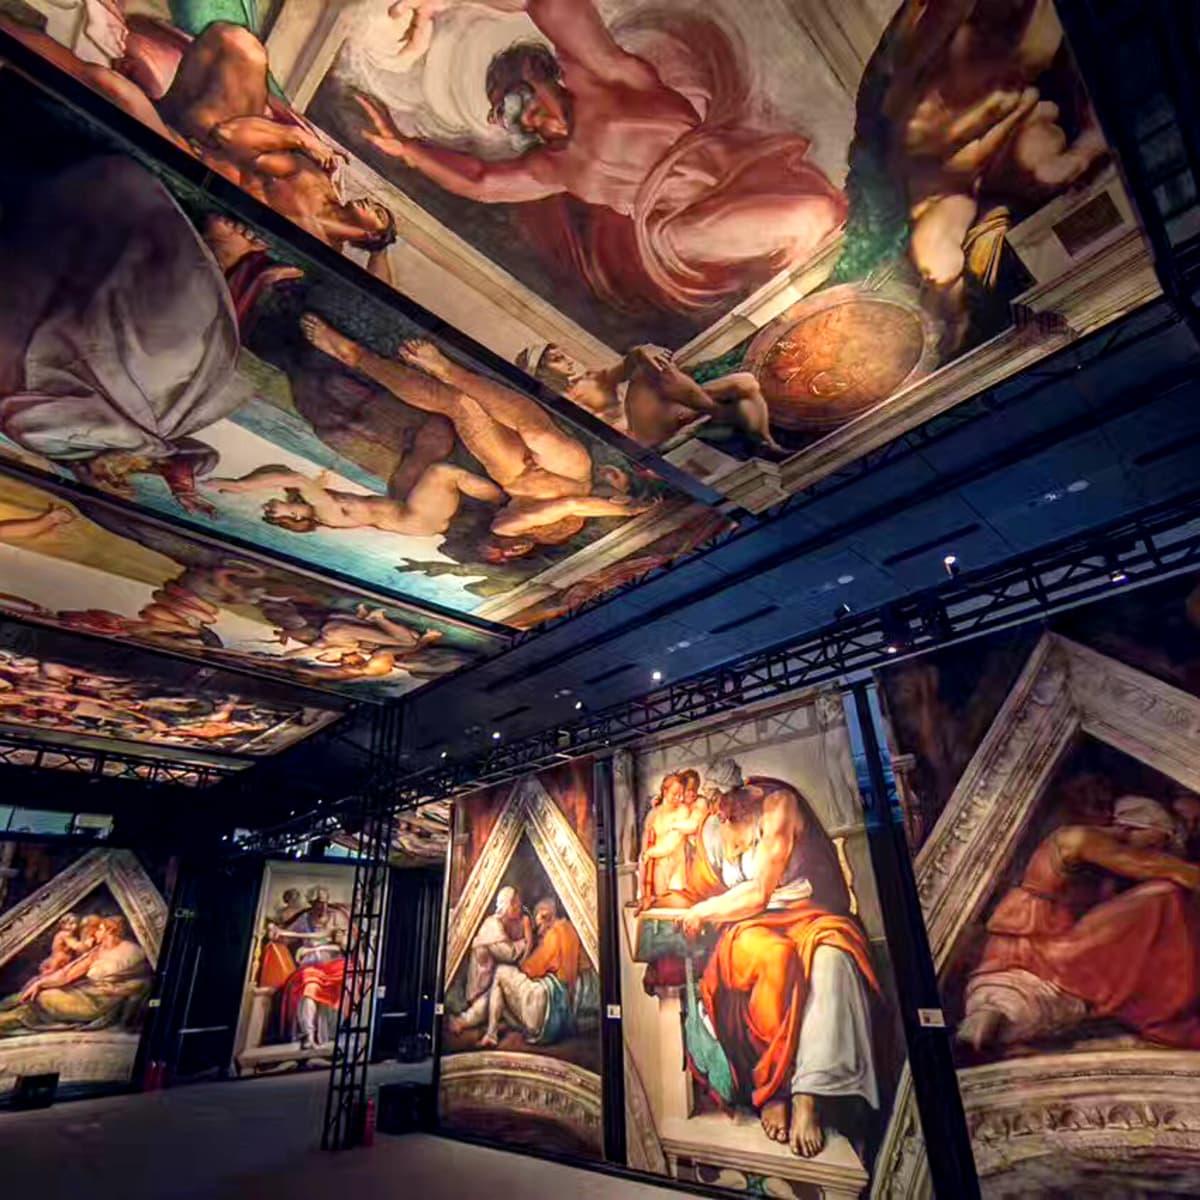 Houston Sistine Chapel exhibition